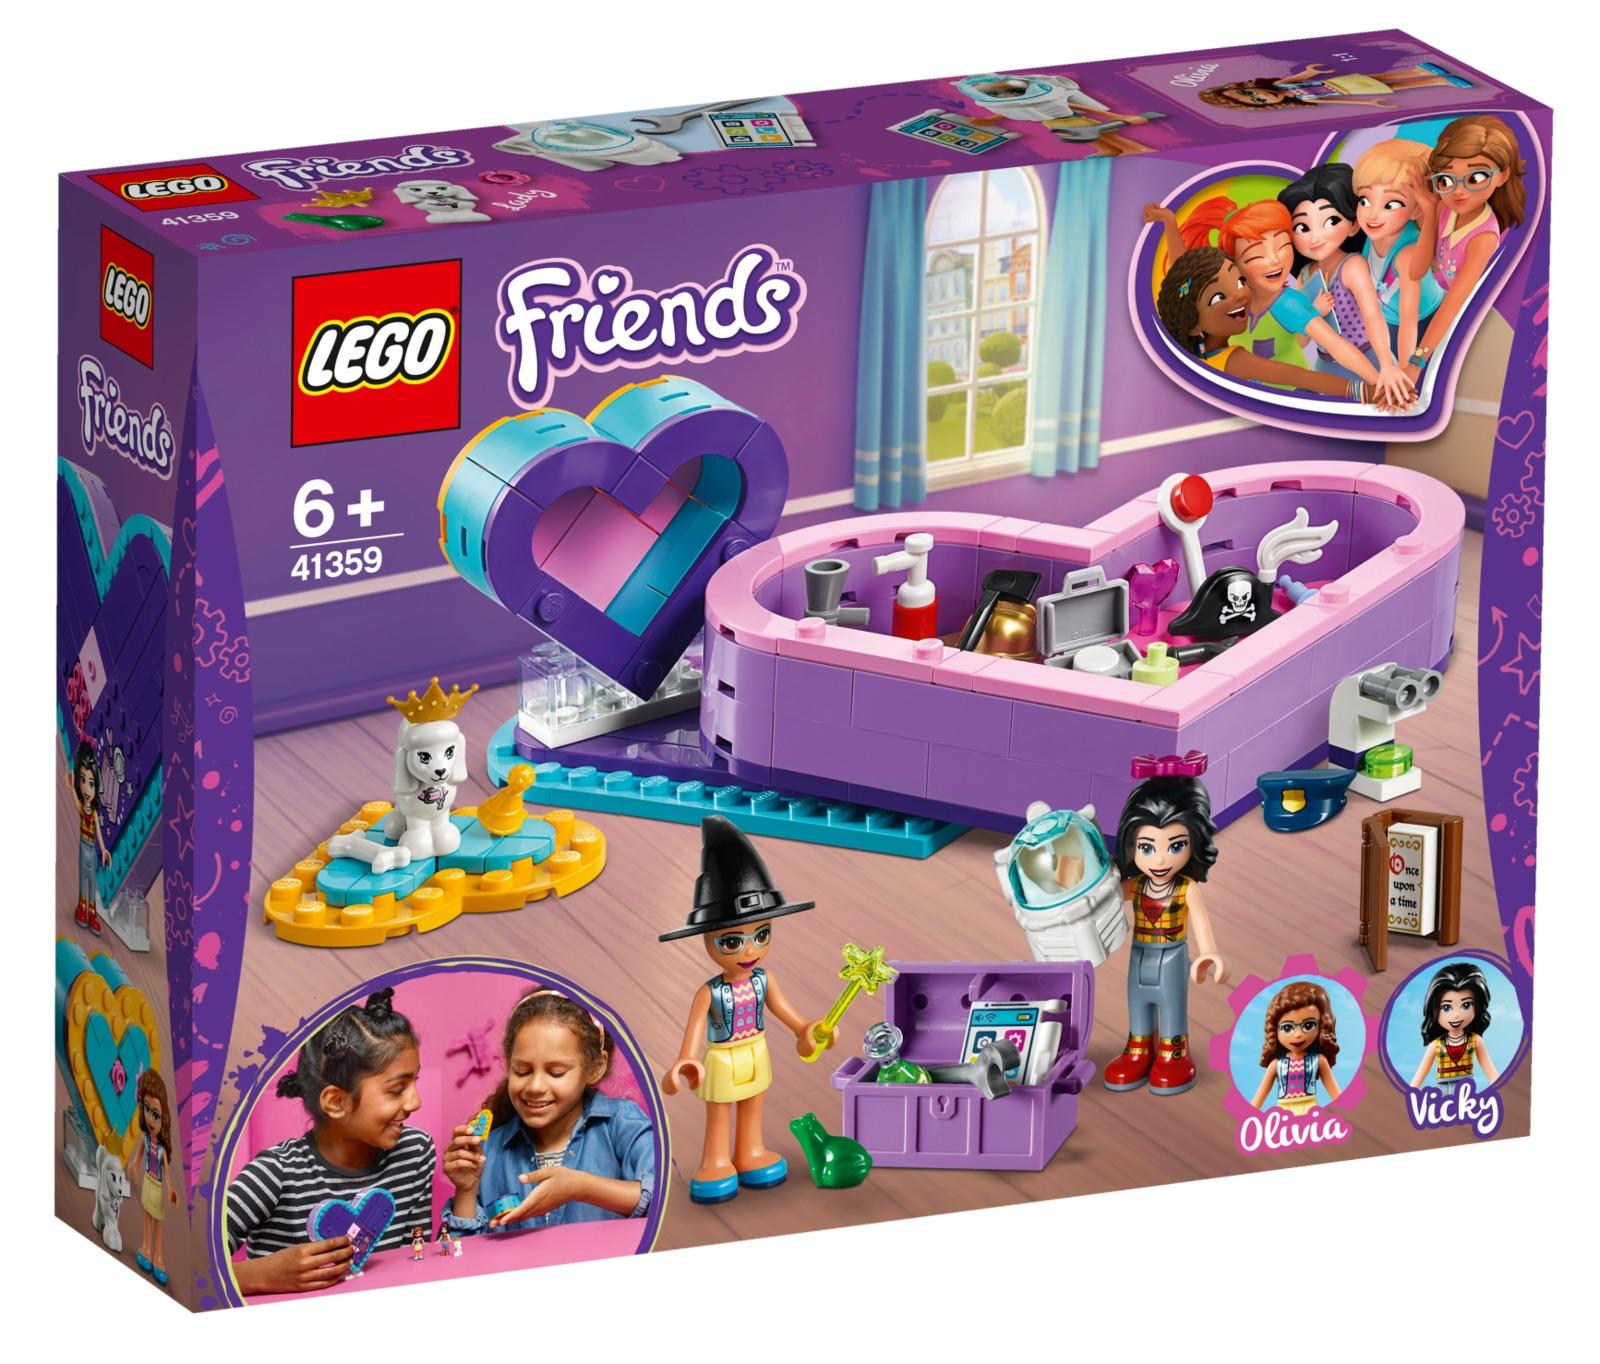 LEGO Friends: Heart Box Friendship Pack (41359) image